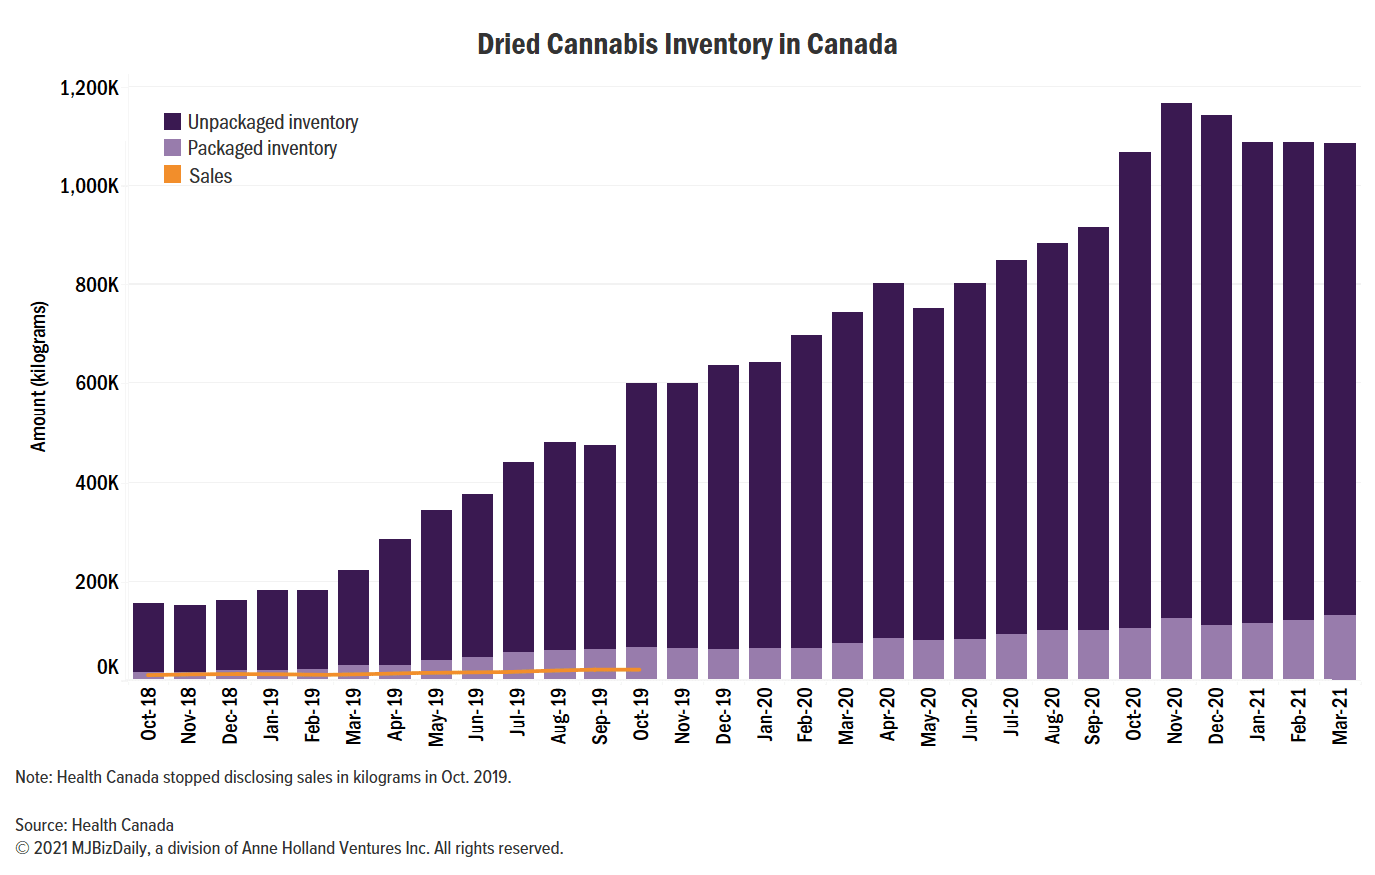 Canadian dried cannabis, Canada's dried cannabis inventory falls four consecutive months